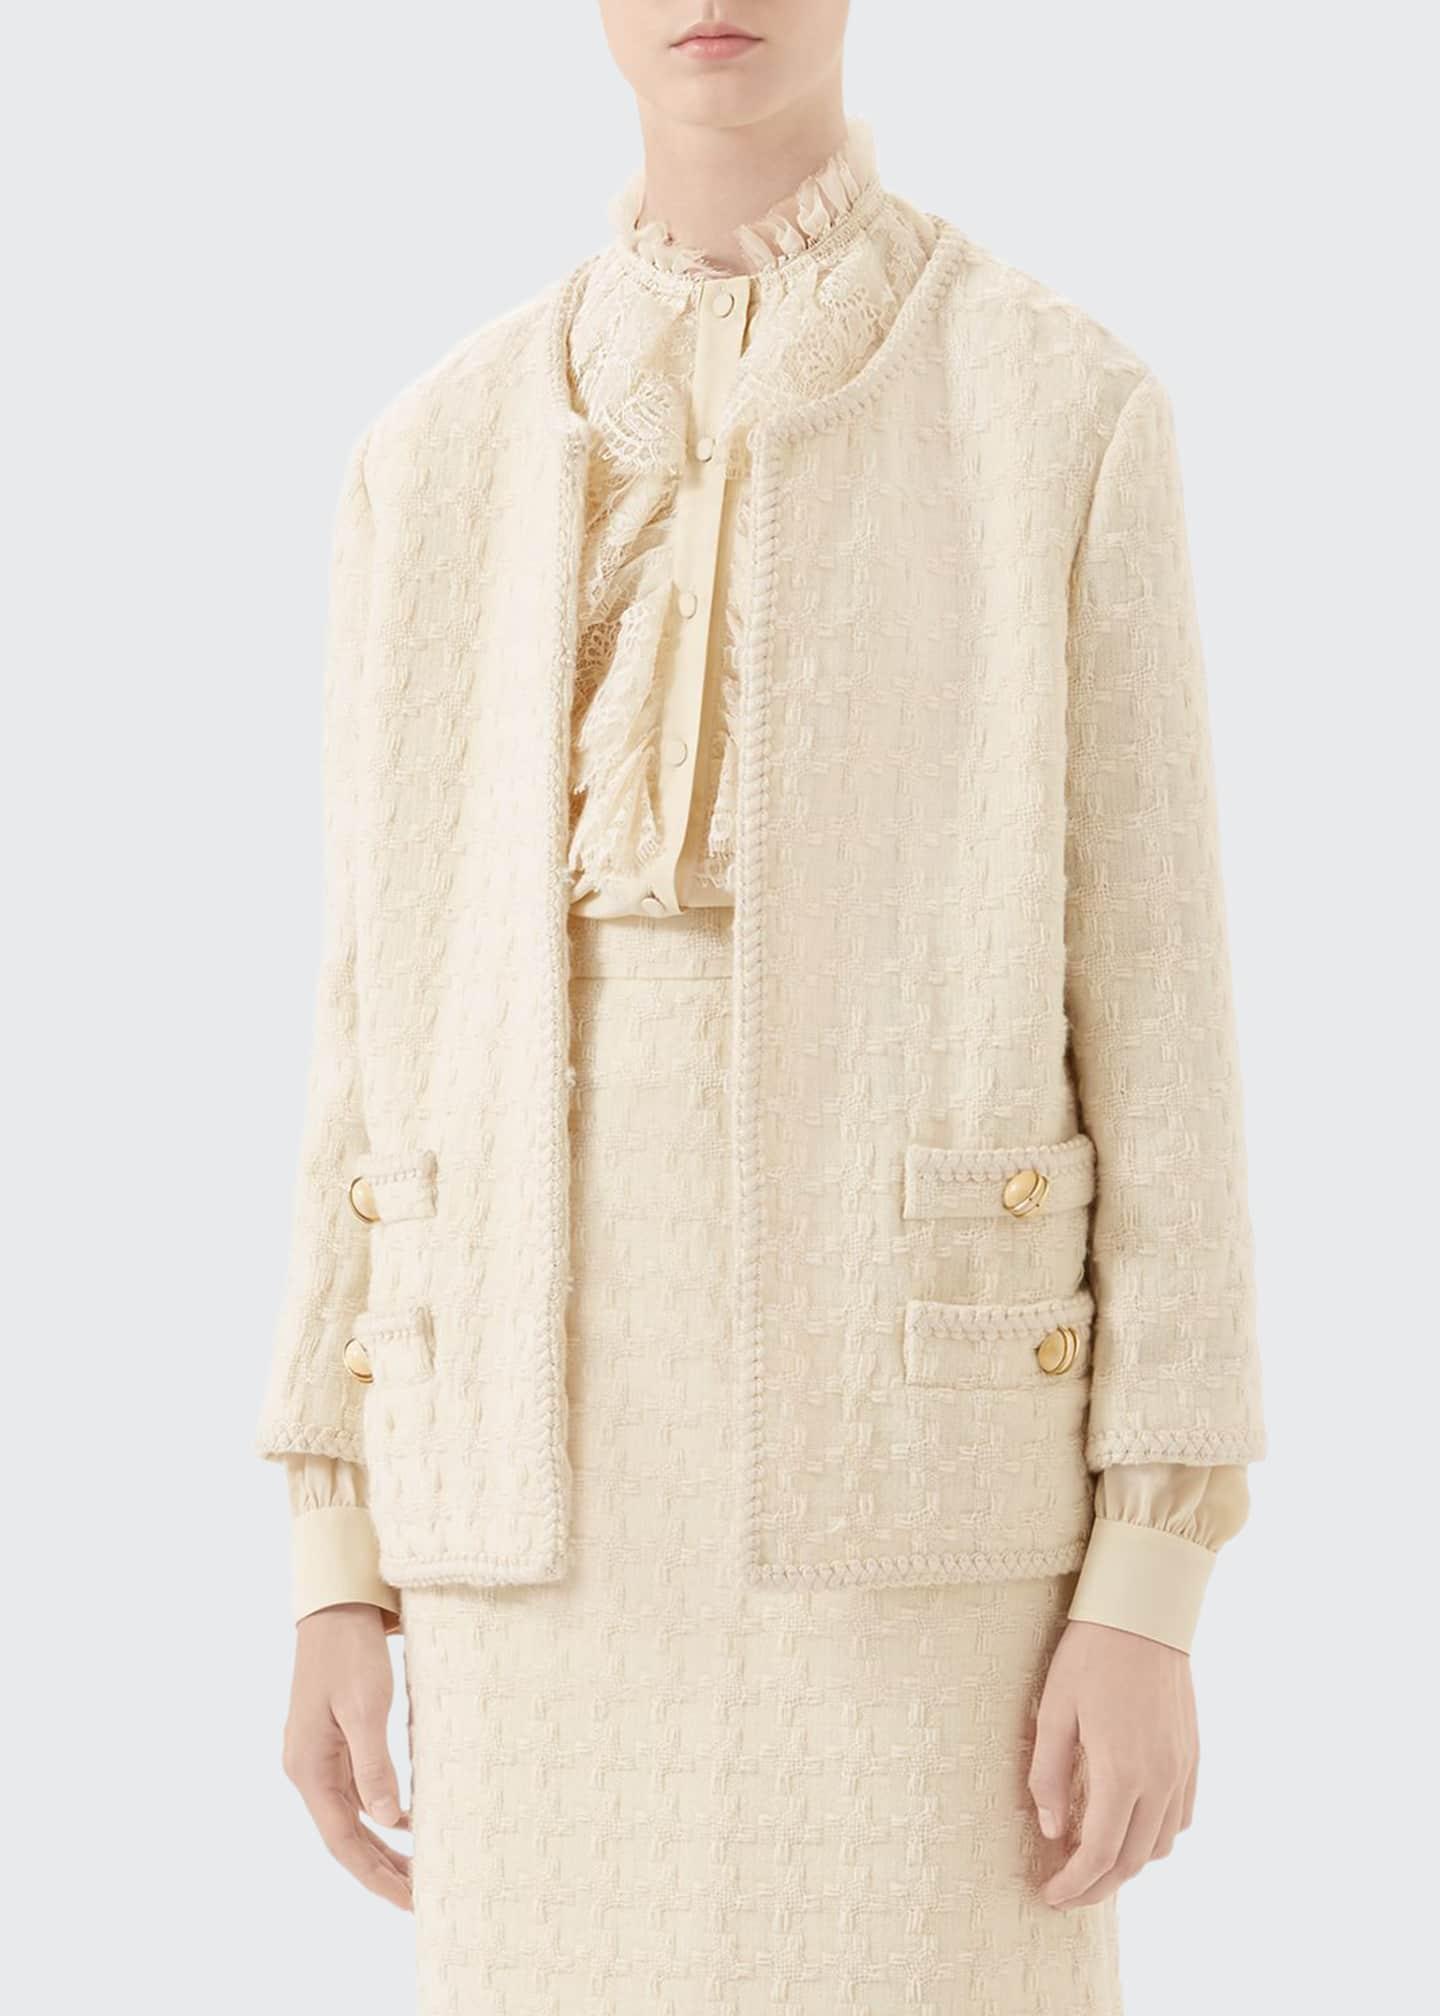 Gucci Houndstooth Tweed Jacket